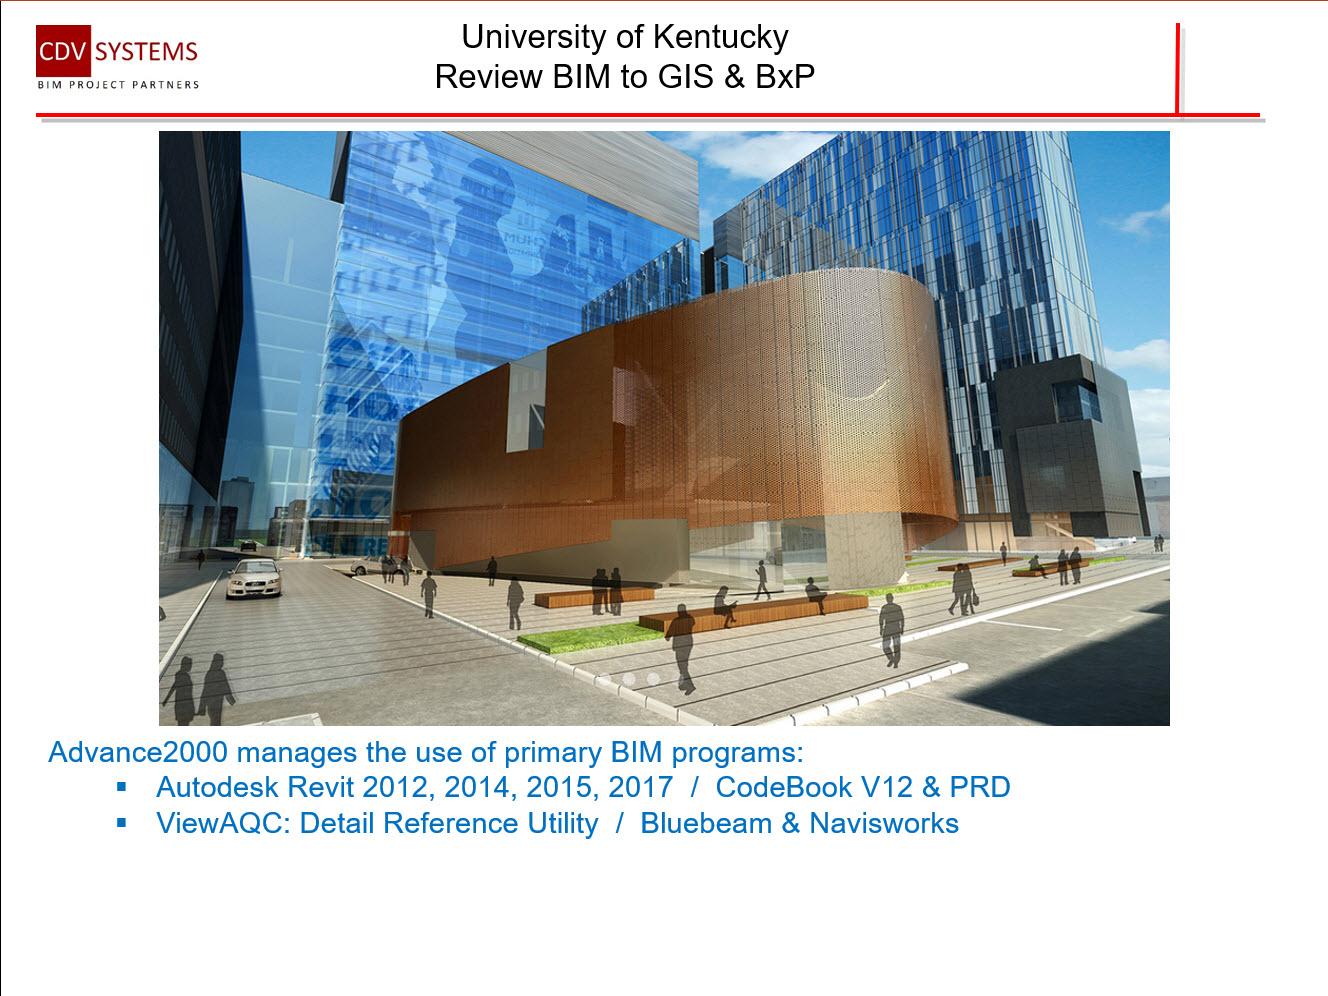 University of Kentucky_001t.jpg